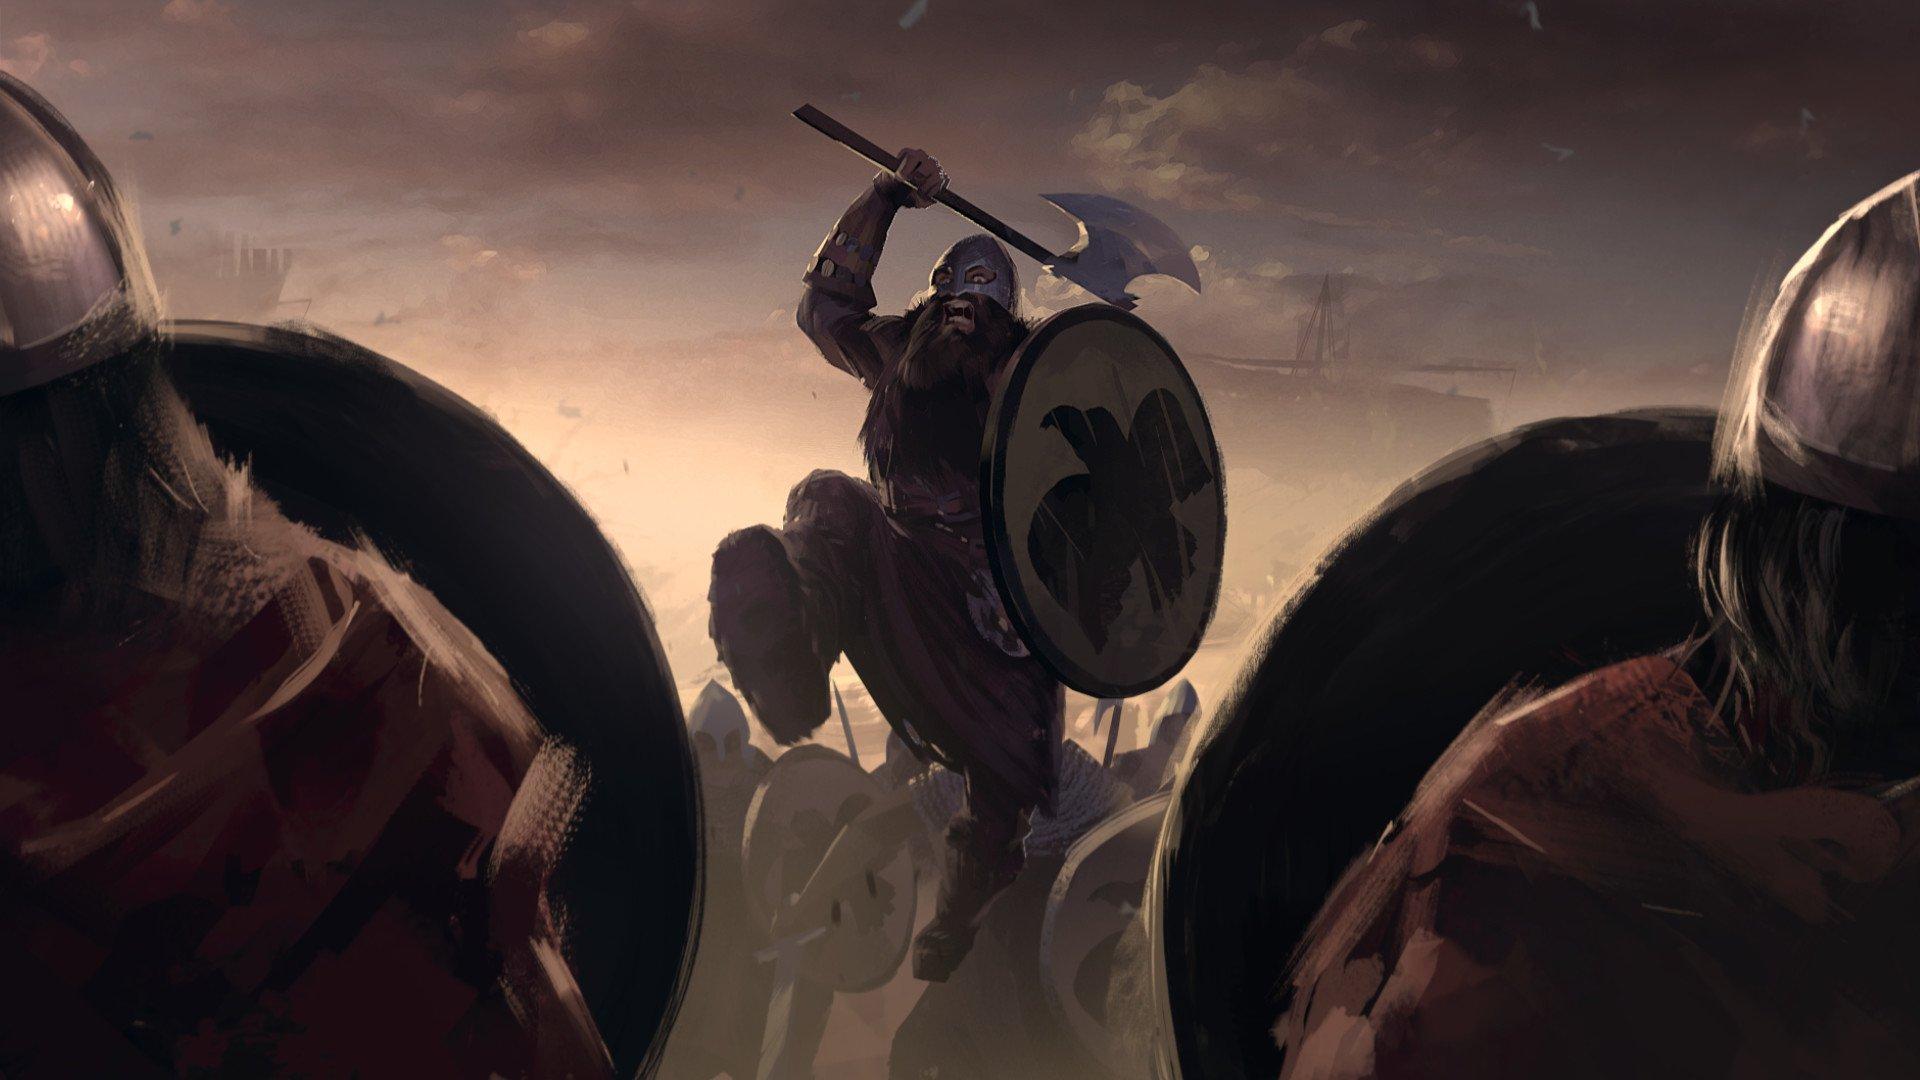 Video Game - Total War Saga: Thrones of Britannia  Wallpaper